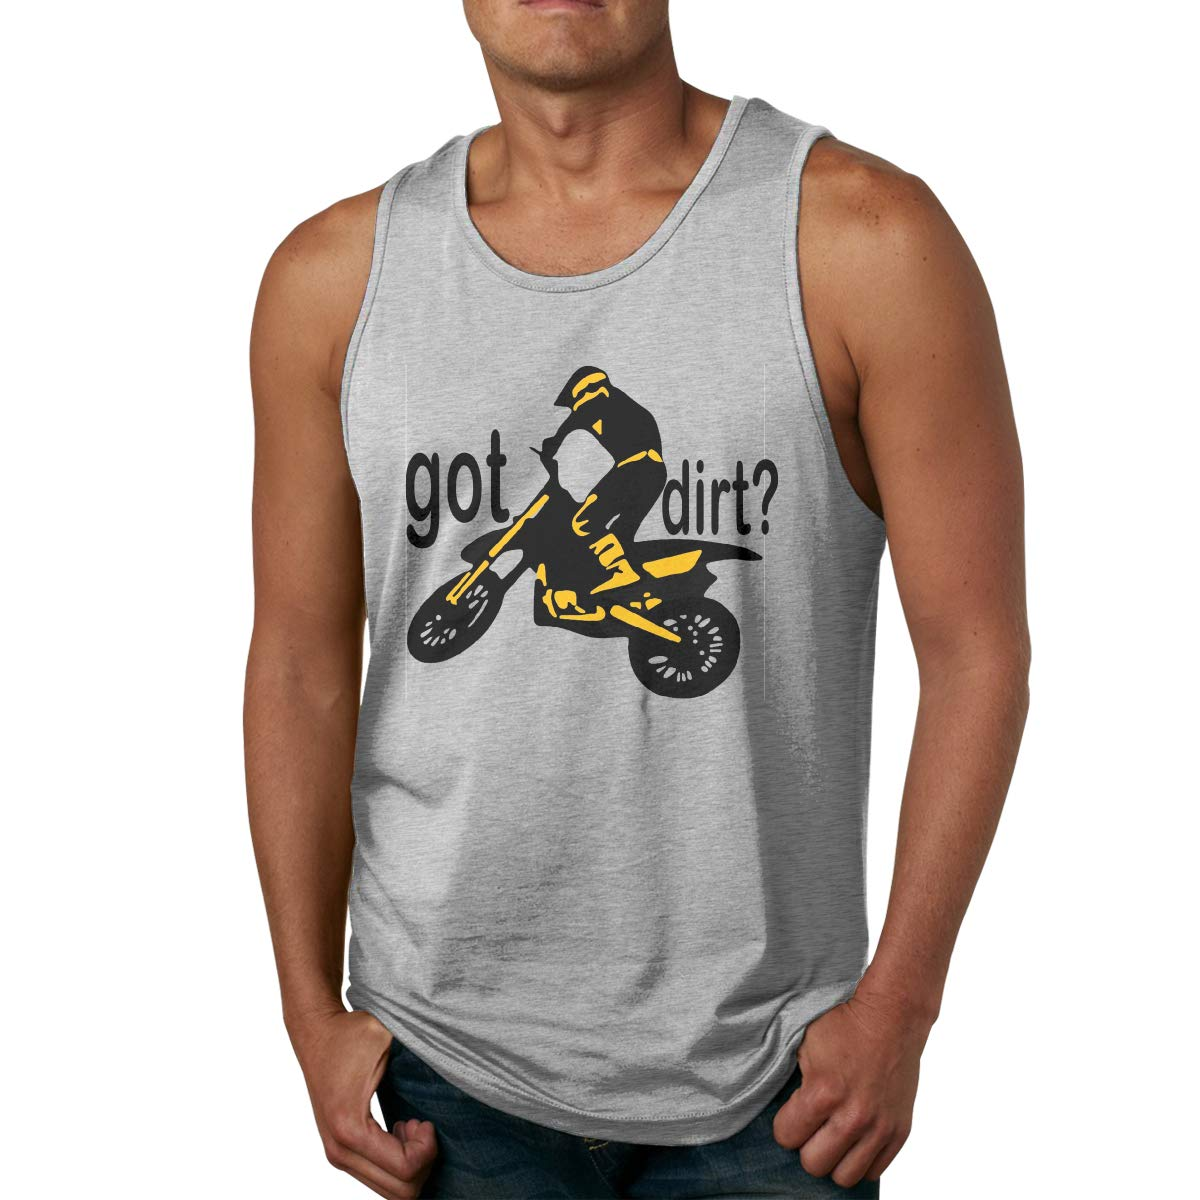 LLXM Got Dirt Bike Motocross Racing Men Printed Vest Sports Tank-Top Shirt Leisure Tees Sleeveless Shirts